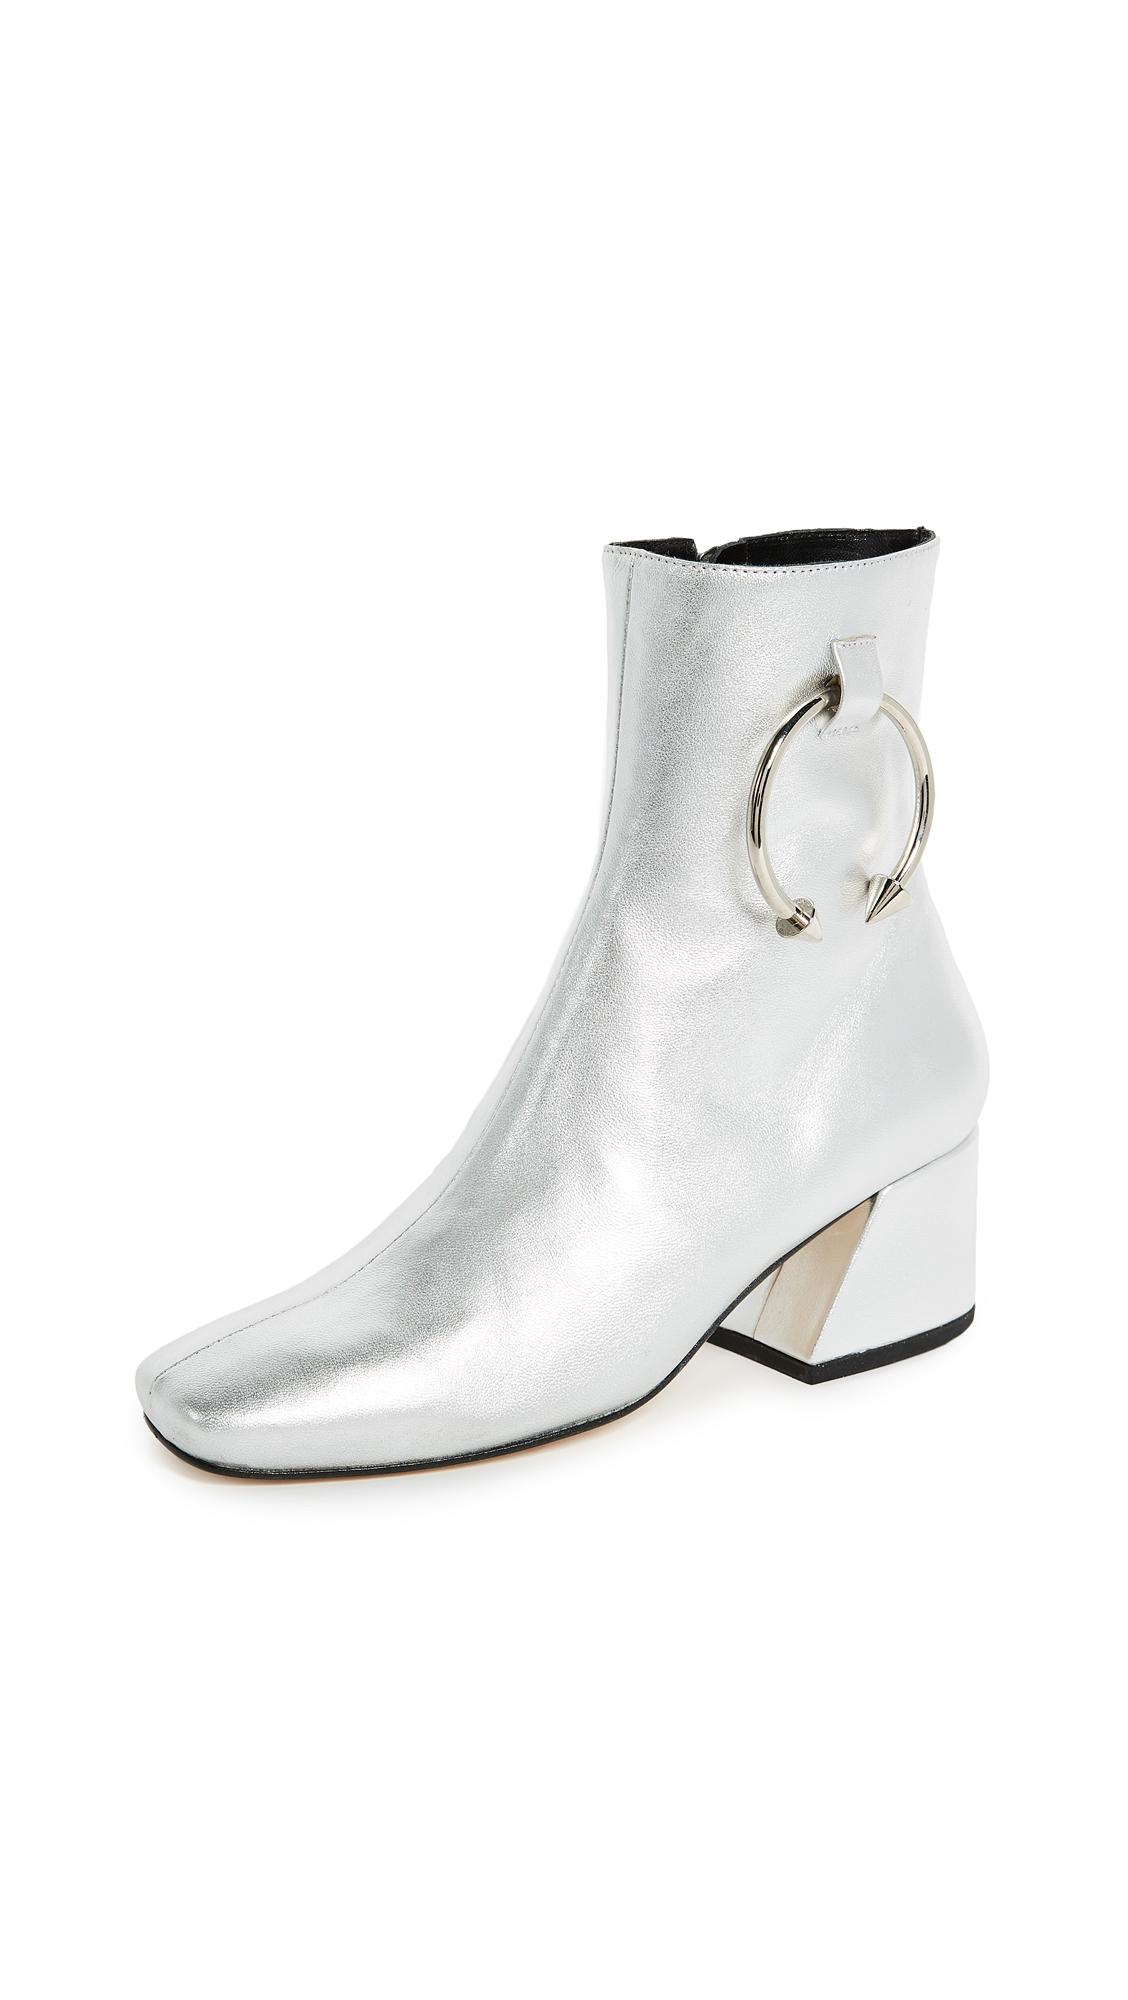 Dorateymur Nizip II Booties - Silver